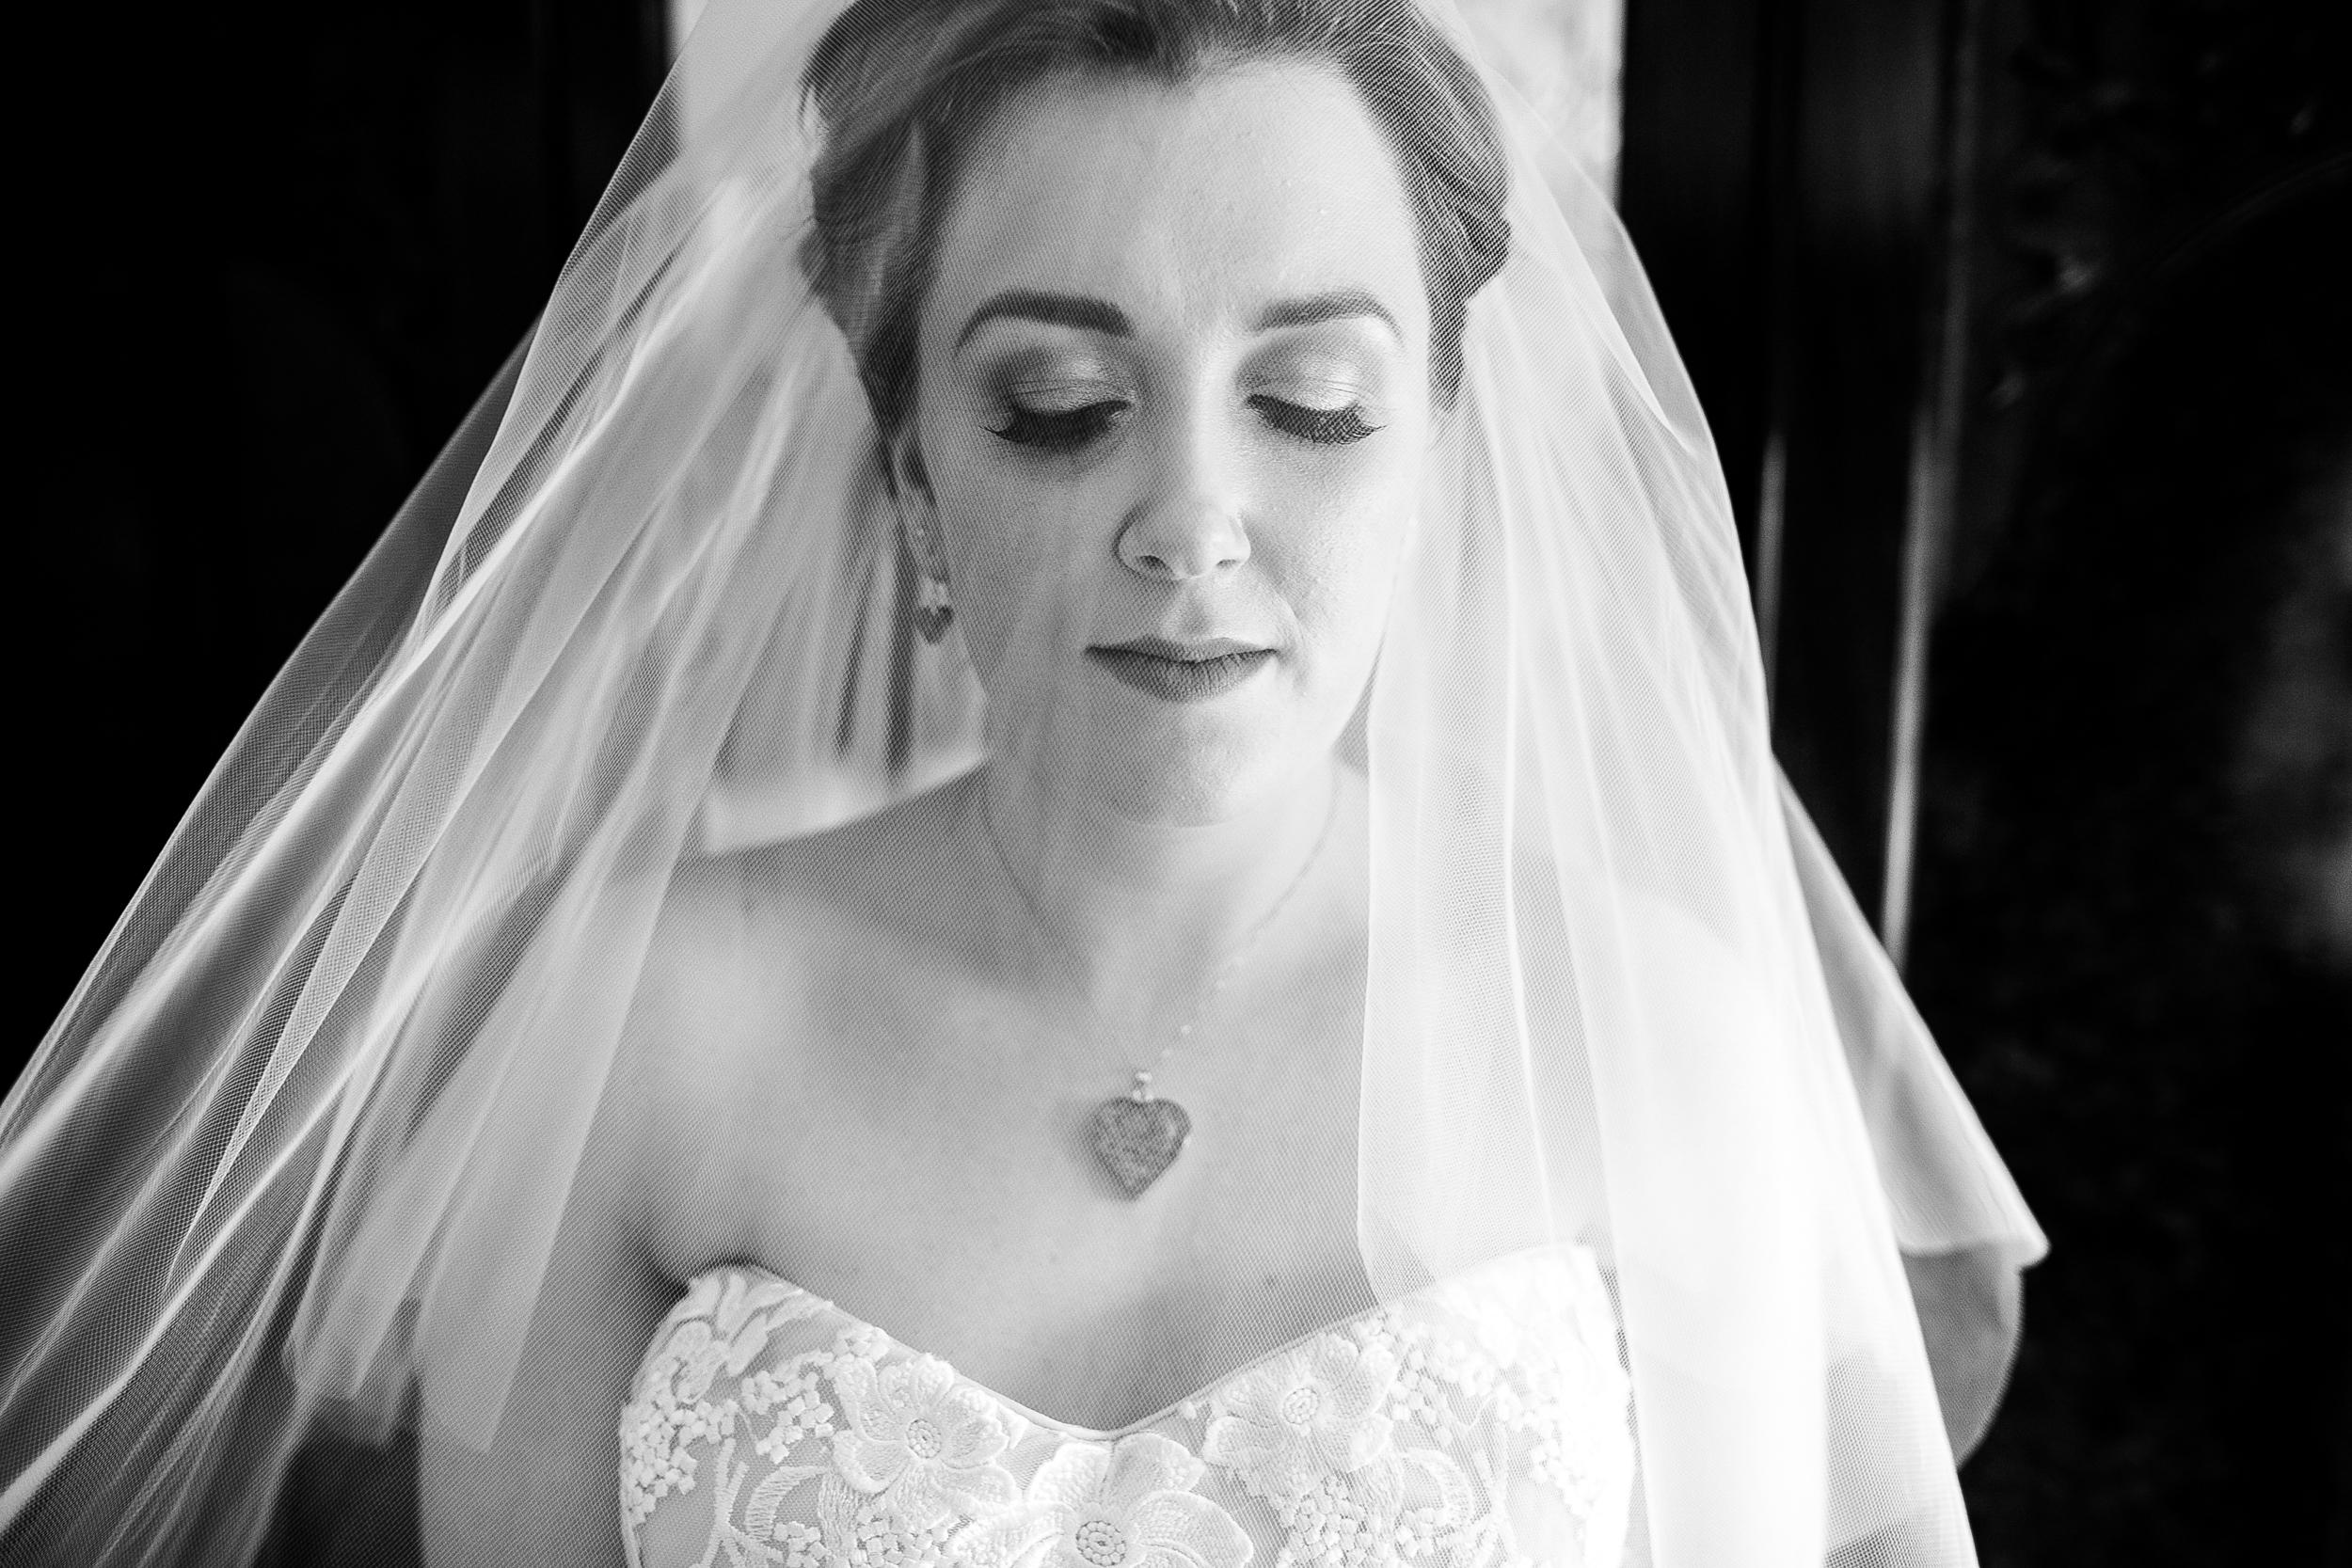 creative-wedding-photography-teesside-north-east-yorkshire-139.jpg